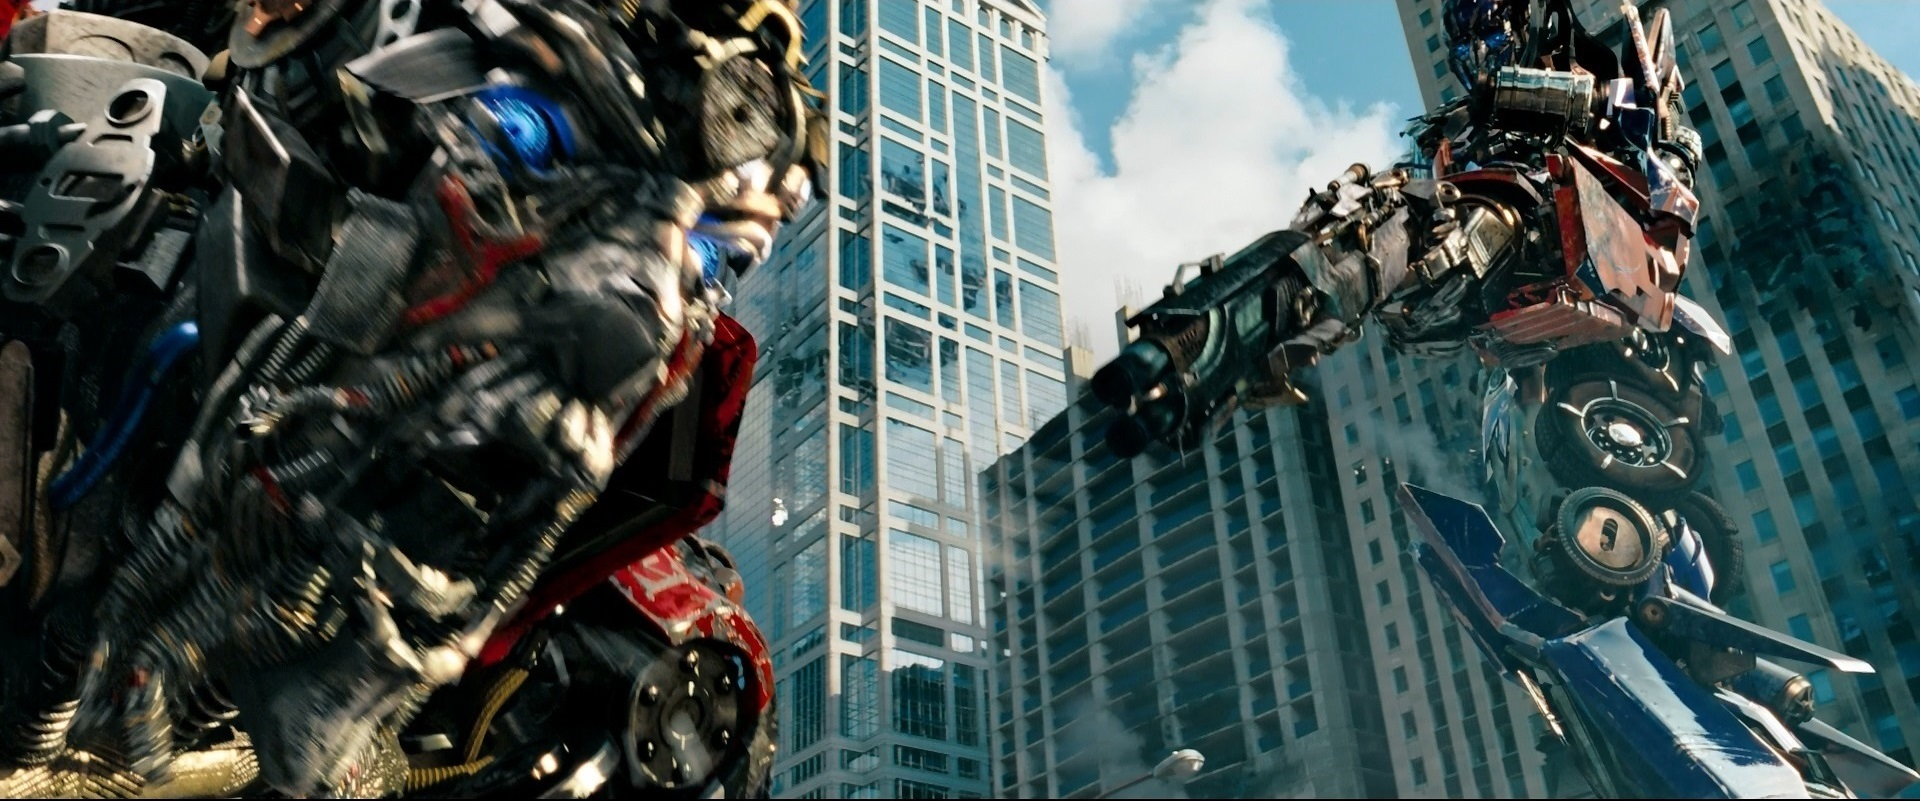 optimus prime   transformers movie wiki   fandom poweredwikia